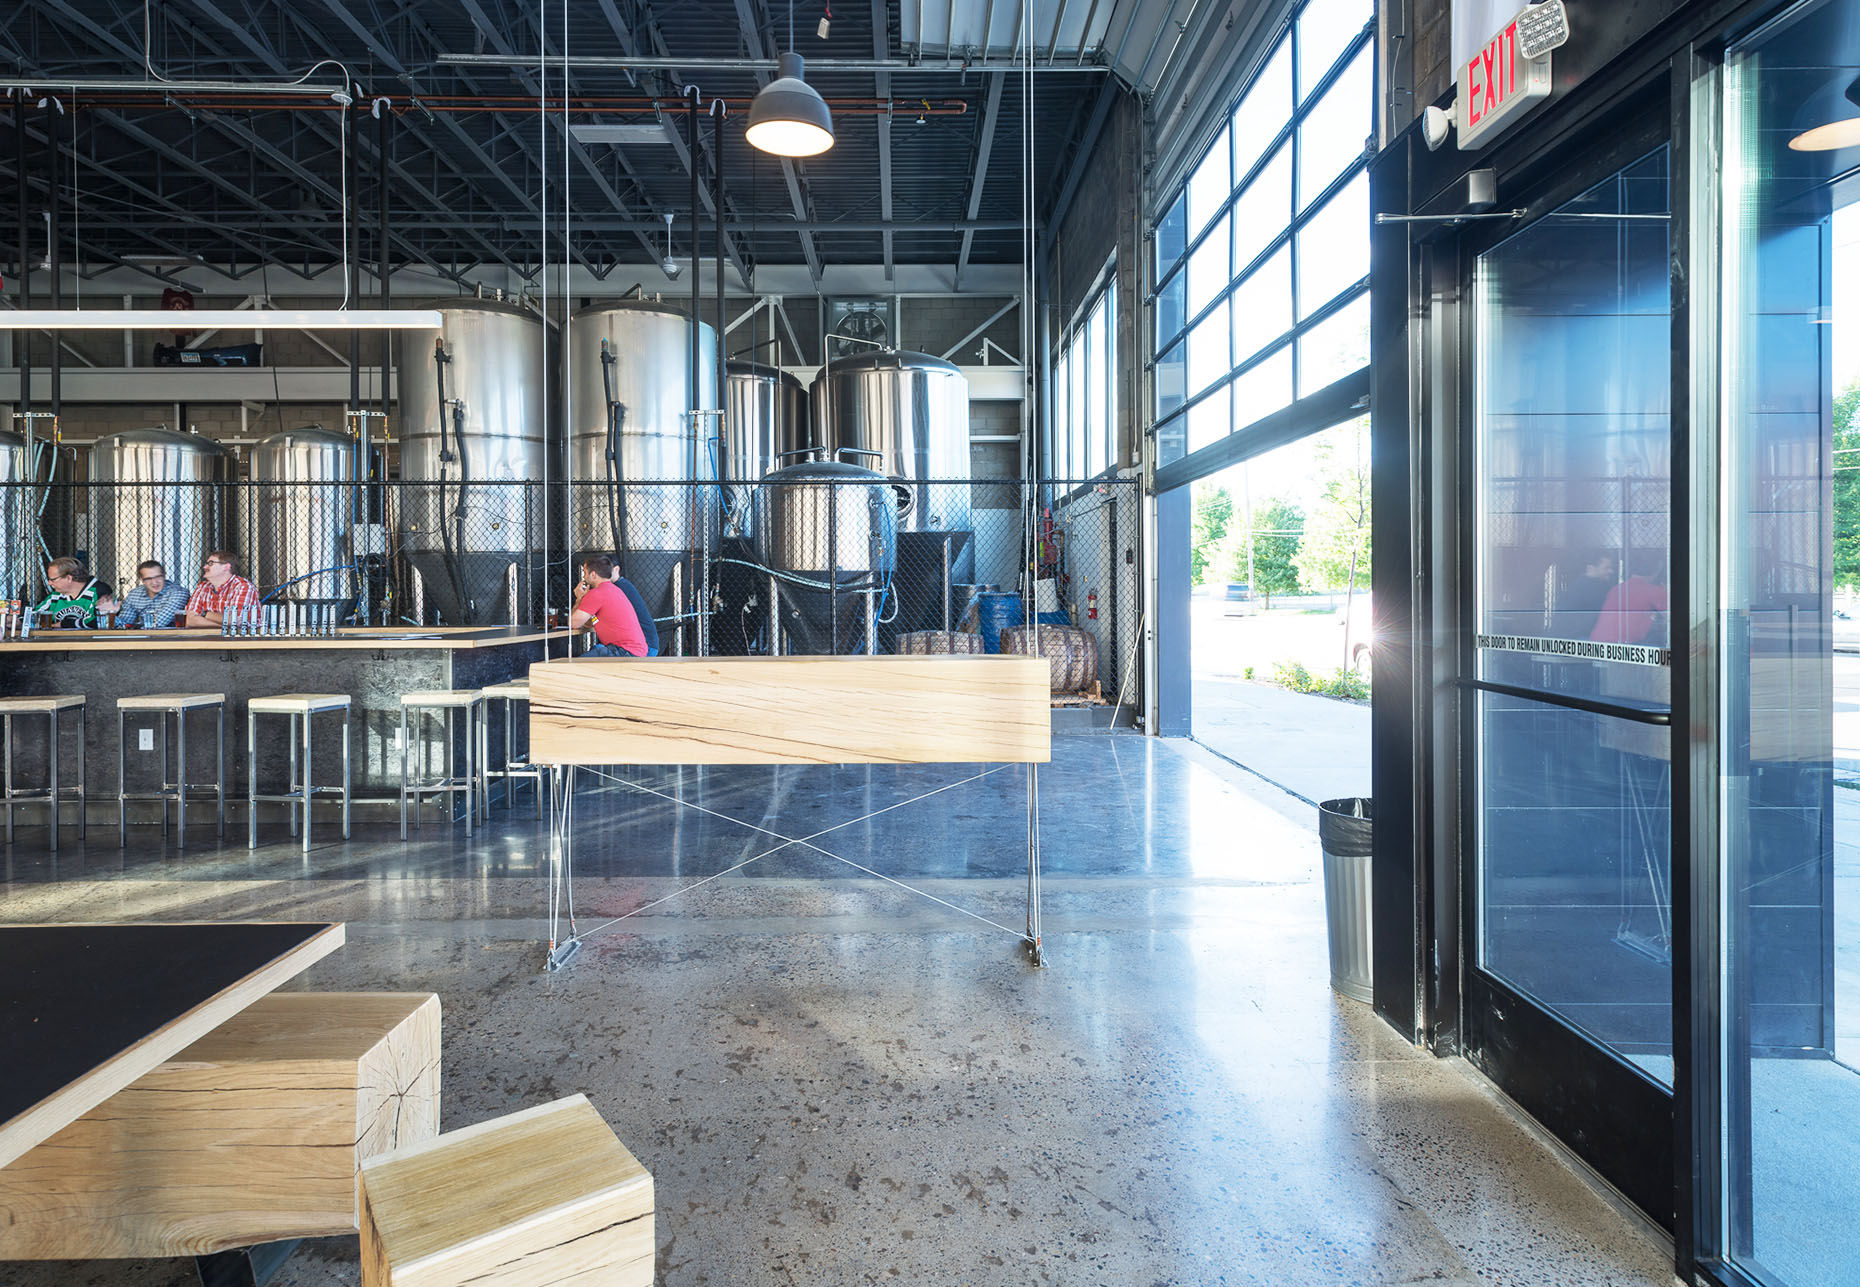 Modern brewery remodel in North Loop neighborhood of Minneapolis by Christian Dean Architecture.